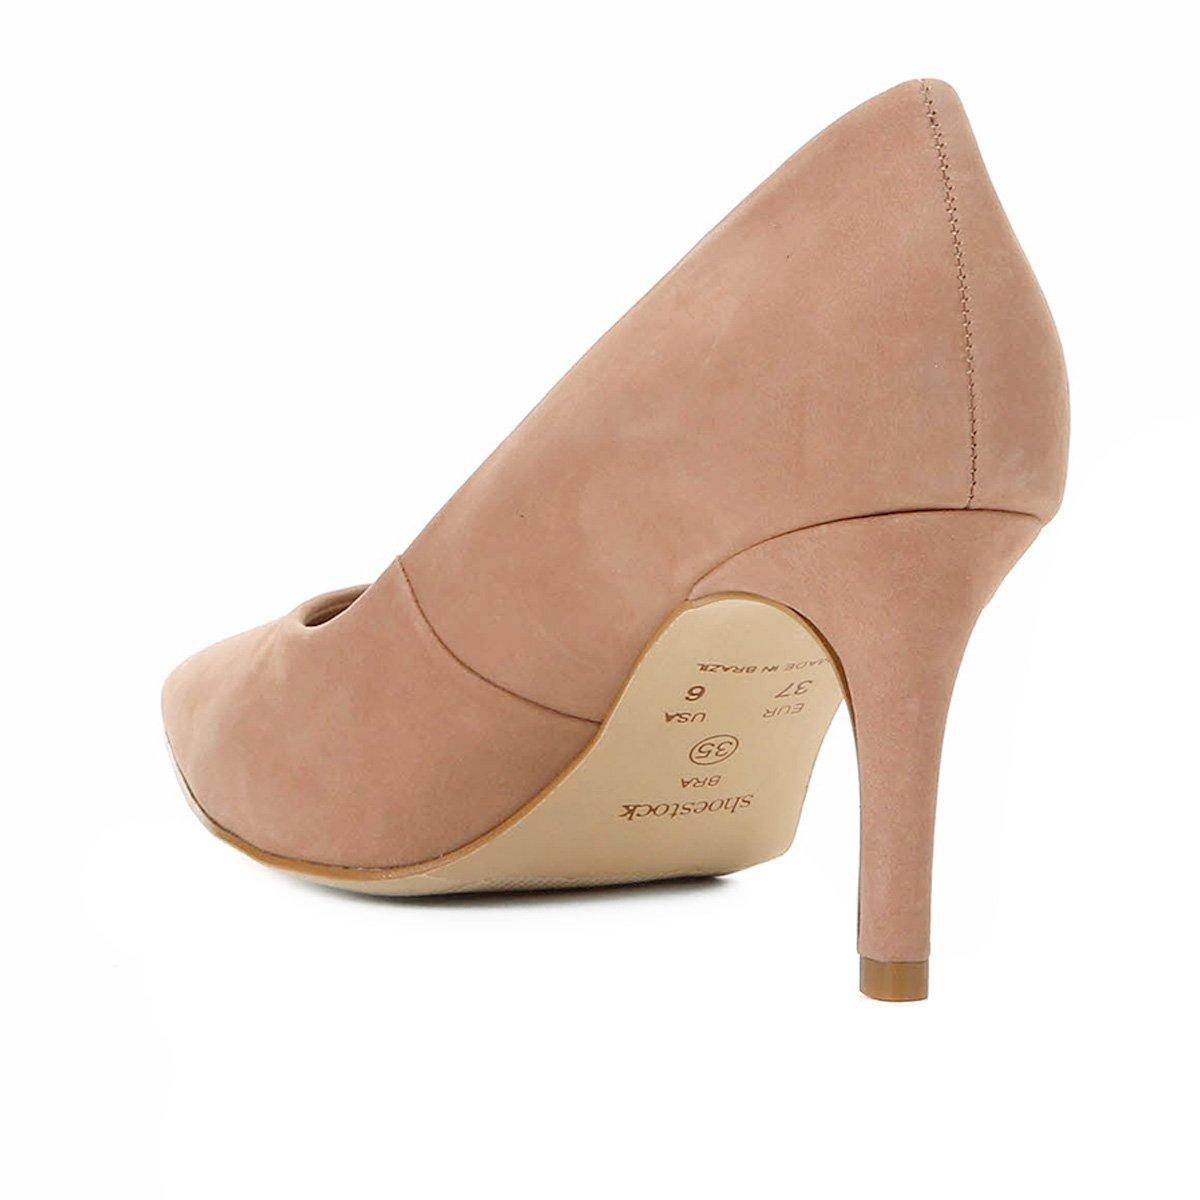 Scarpin Shoestock Nobuck Salto Médio Bico Fino - Nude RmK65